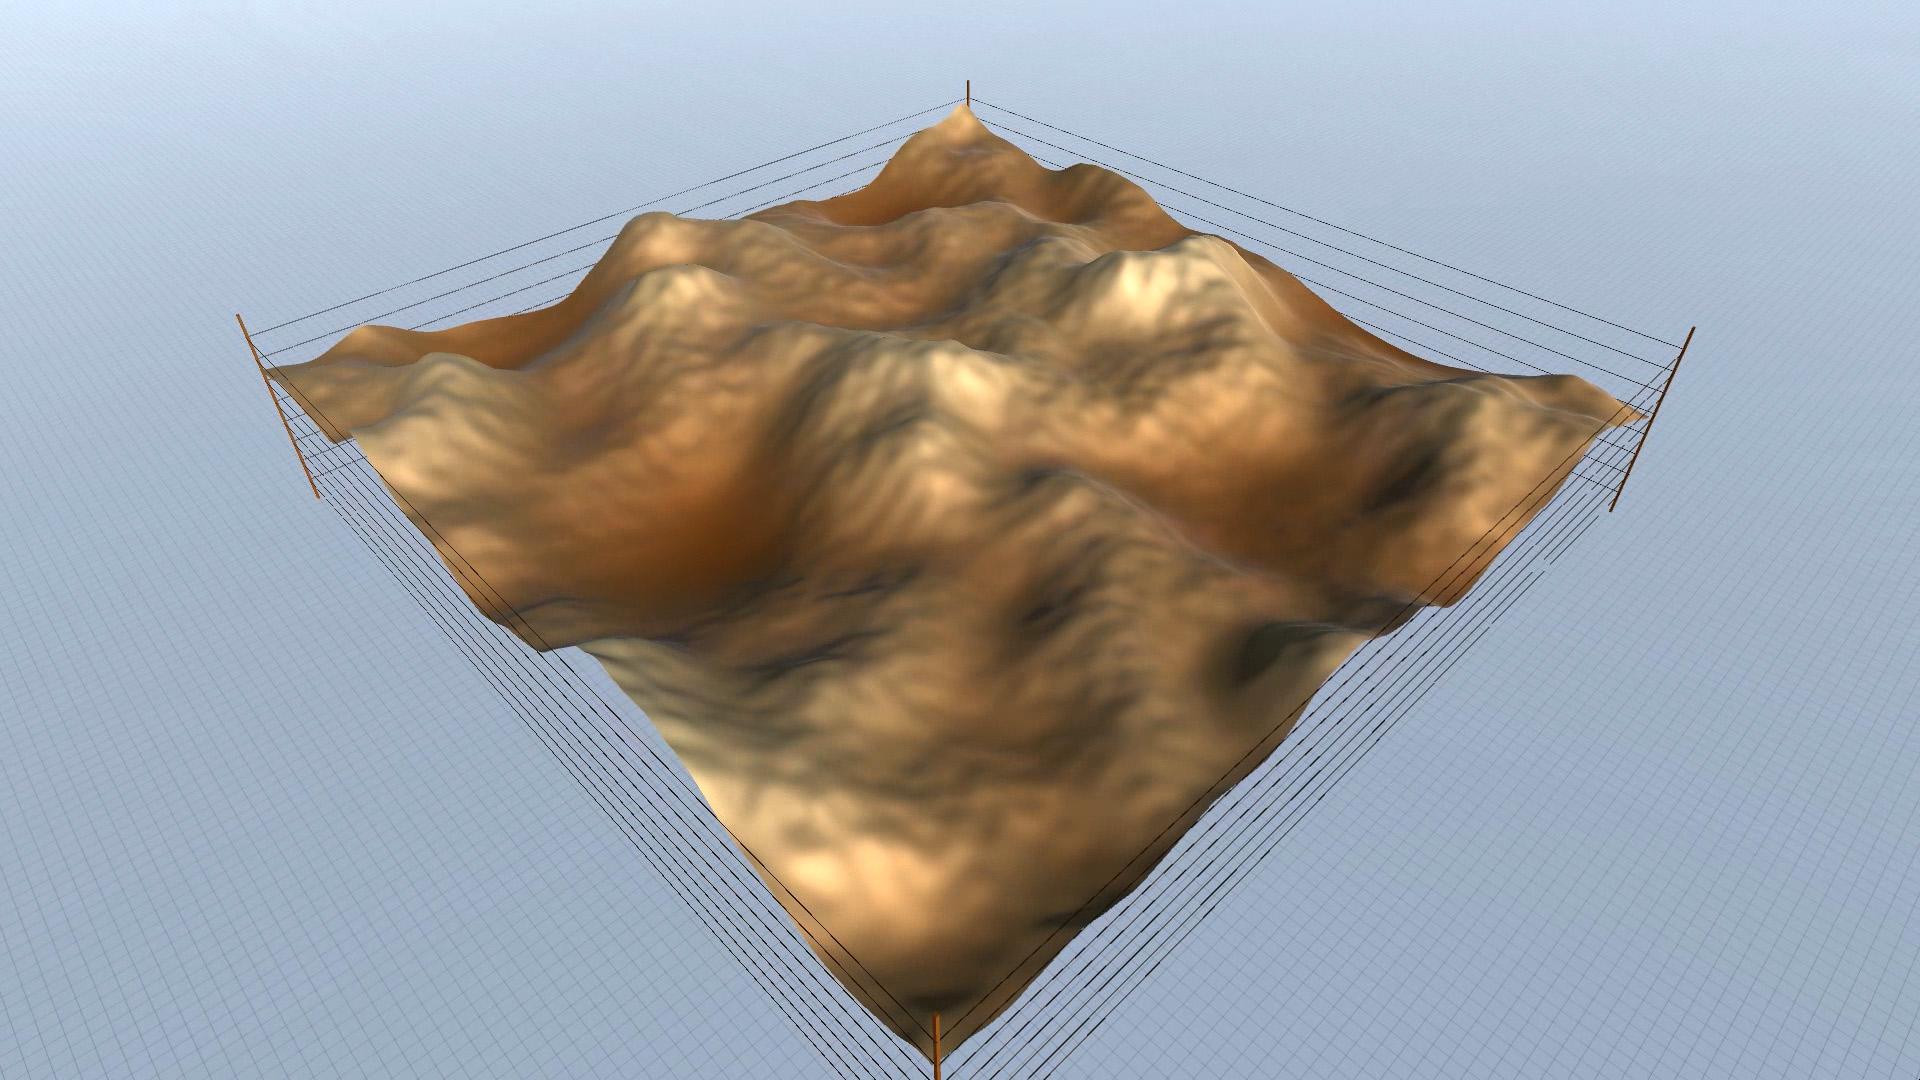 konsfik-procedural-landscape-animated-play-mode-screenshot-5